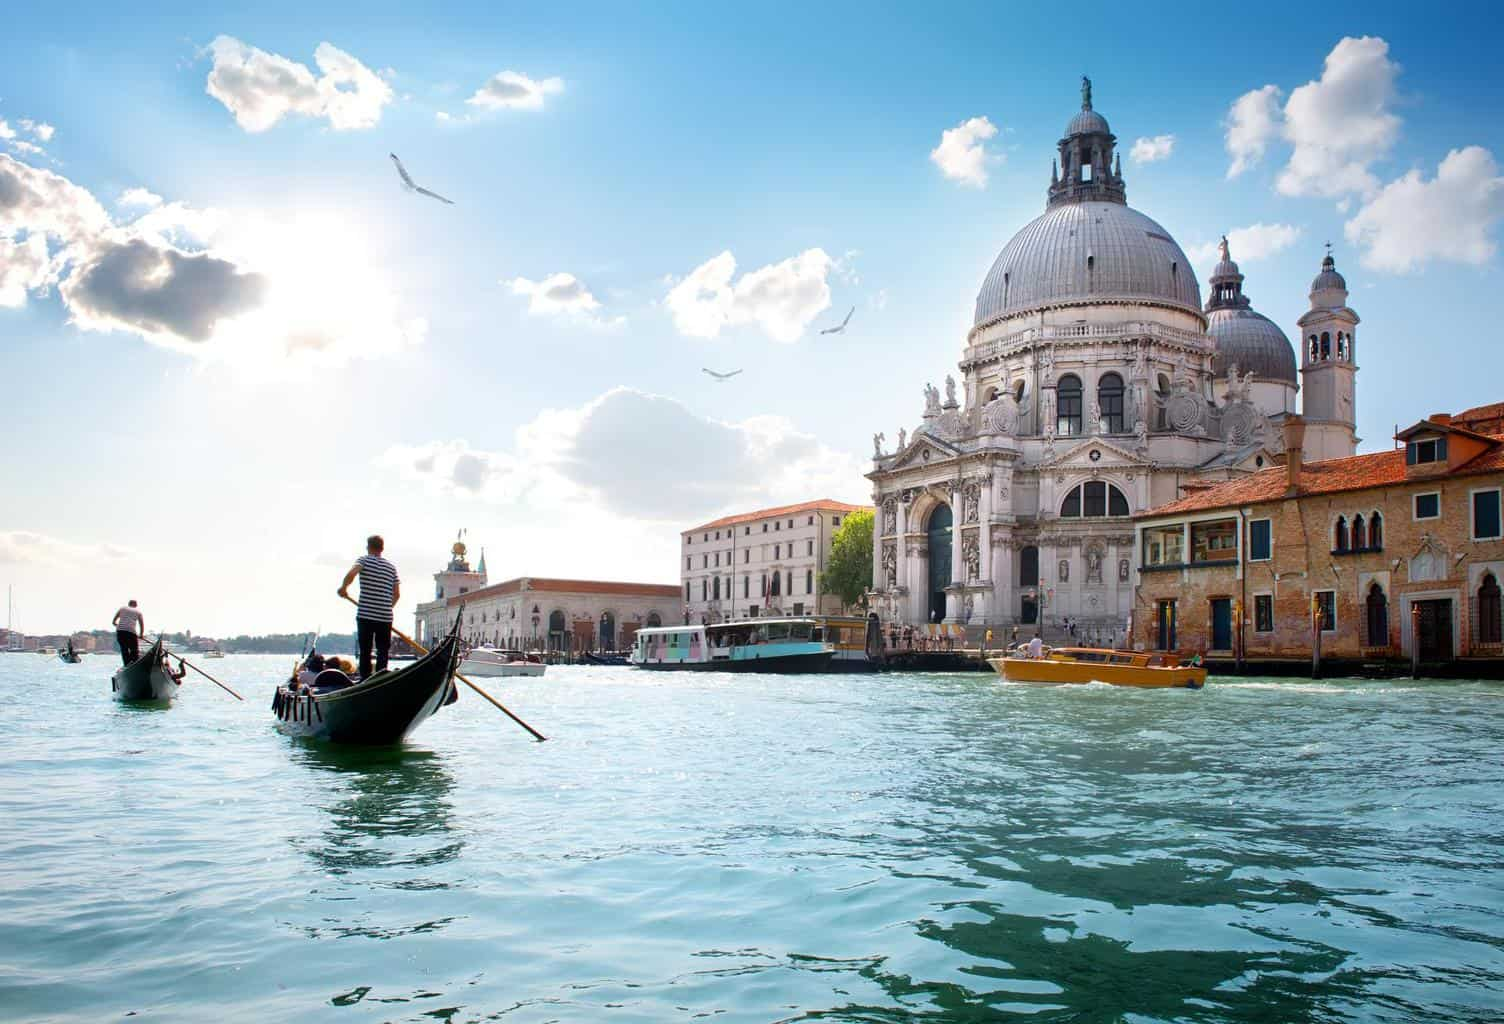 Corona-Konjunkturpaket: Italien fördert Elektroauto-Kauf mit bis zu 10.000 Euro